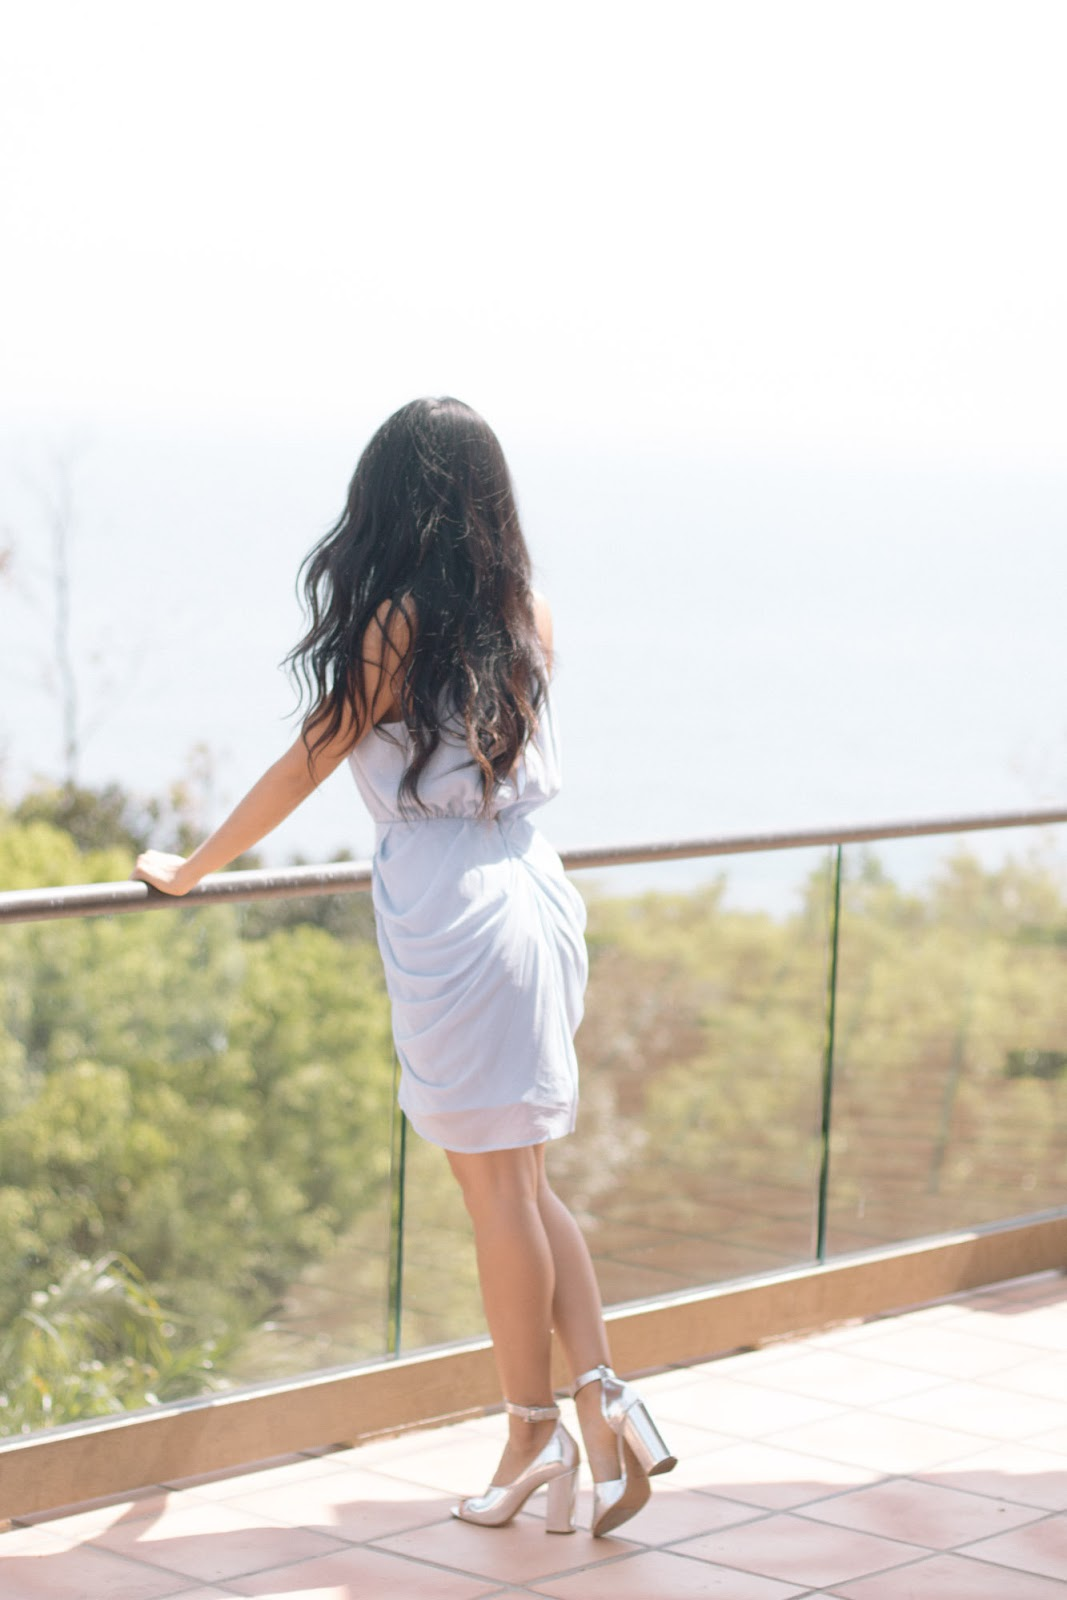 LA best beauty blogger